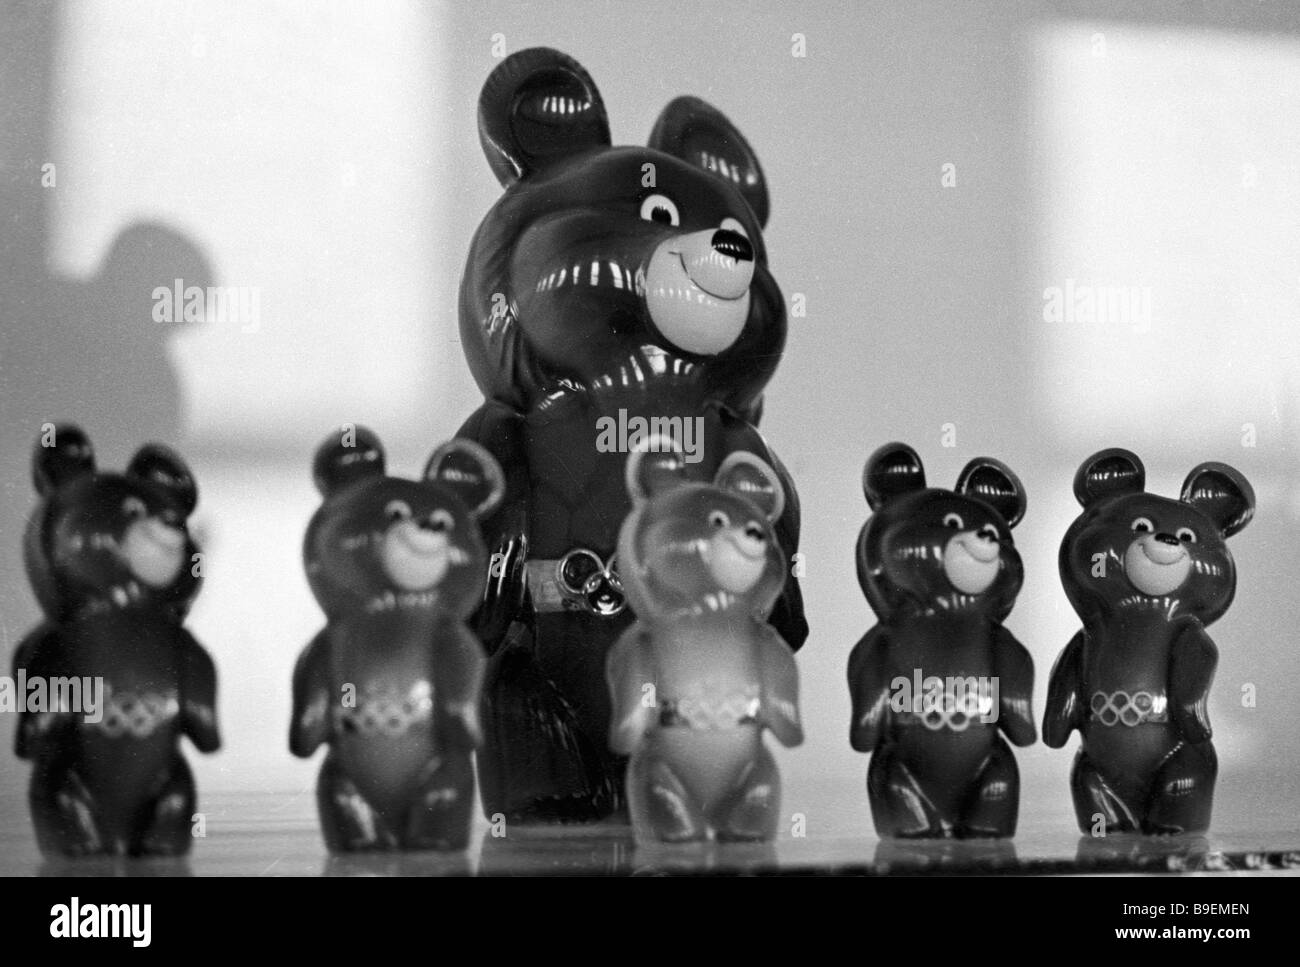 Moscow Olympics 80 bear cub mascot - Stock Image